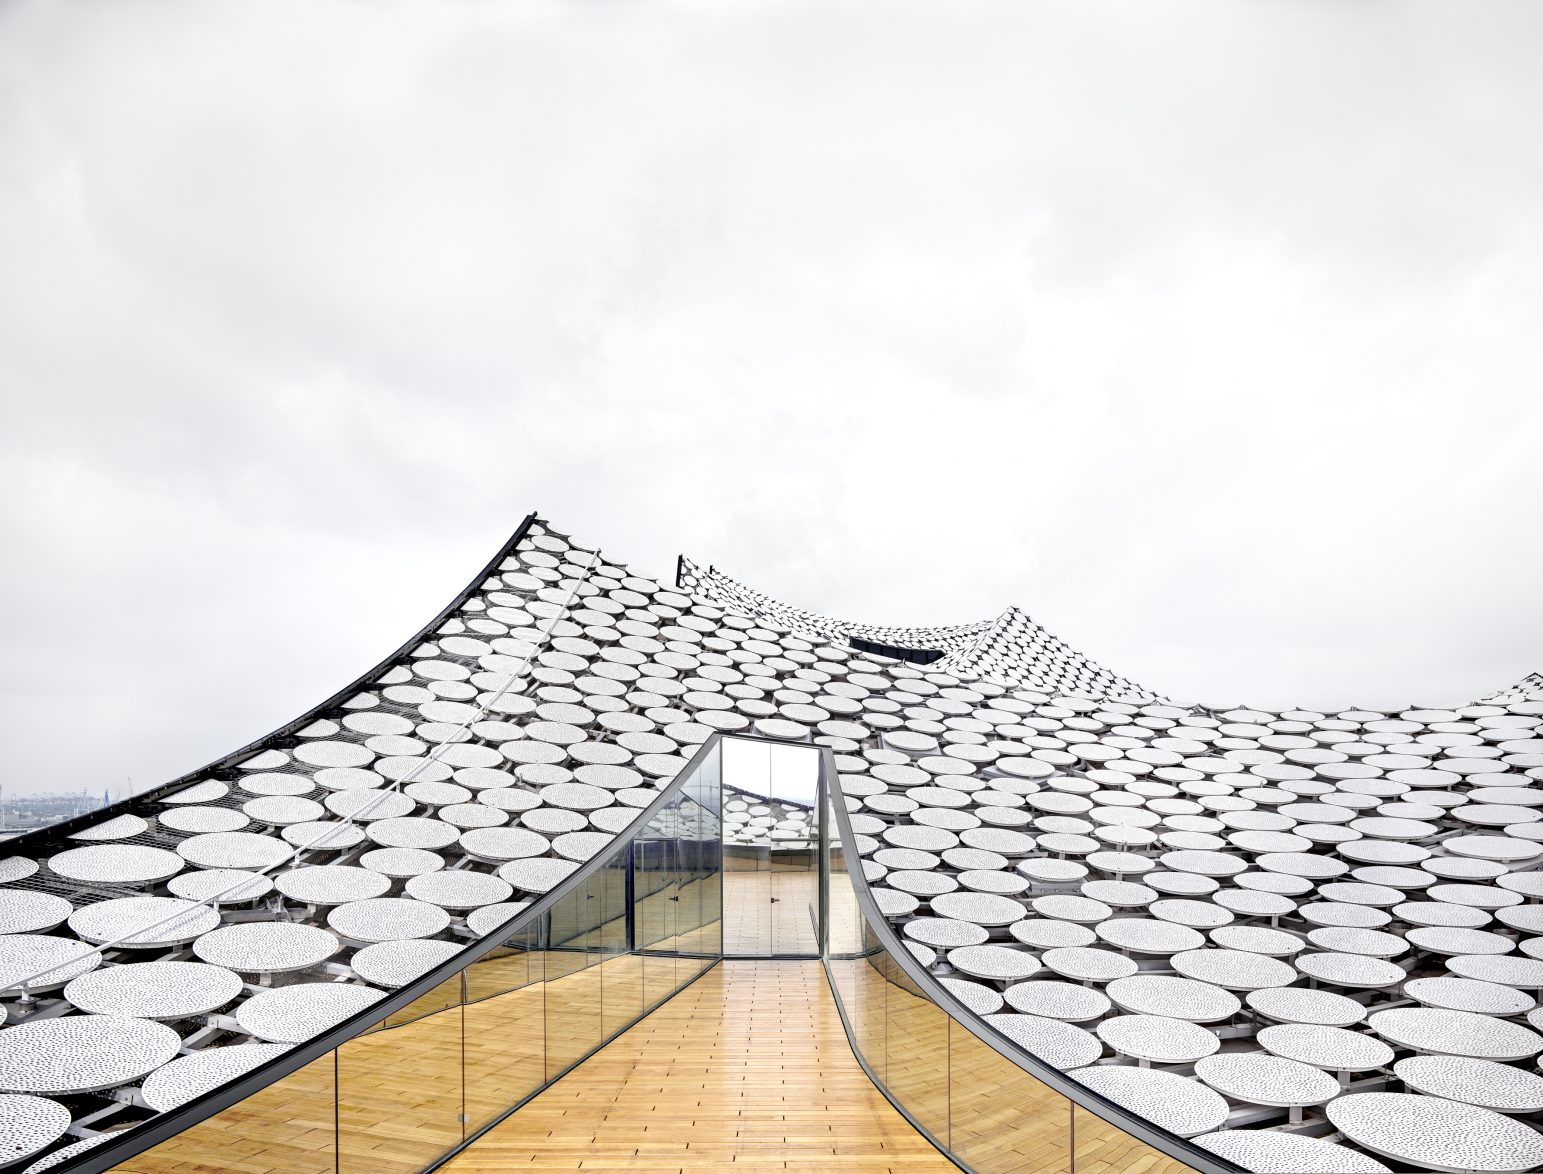 Elbphilharmonie Hamburg Herzog & de Meuron Hamburg 2016, © Candida Höfer / VG Bild Kunst, Bonn, 2016